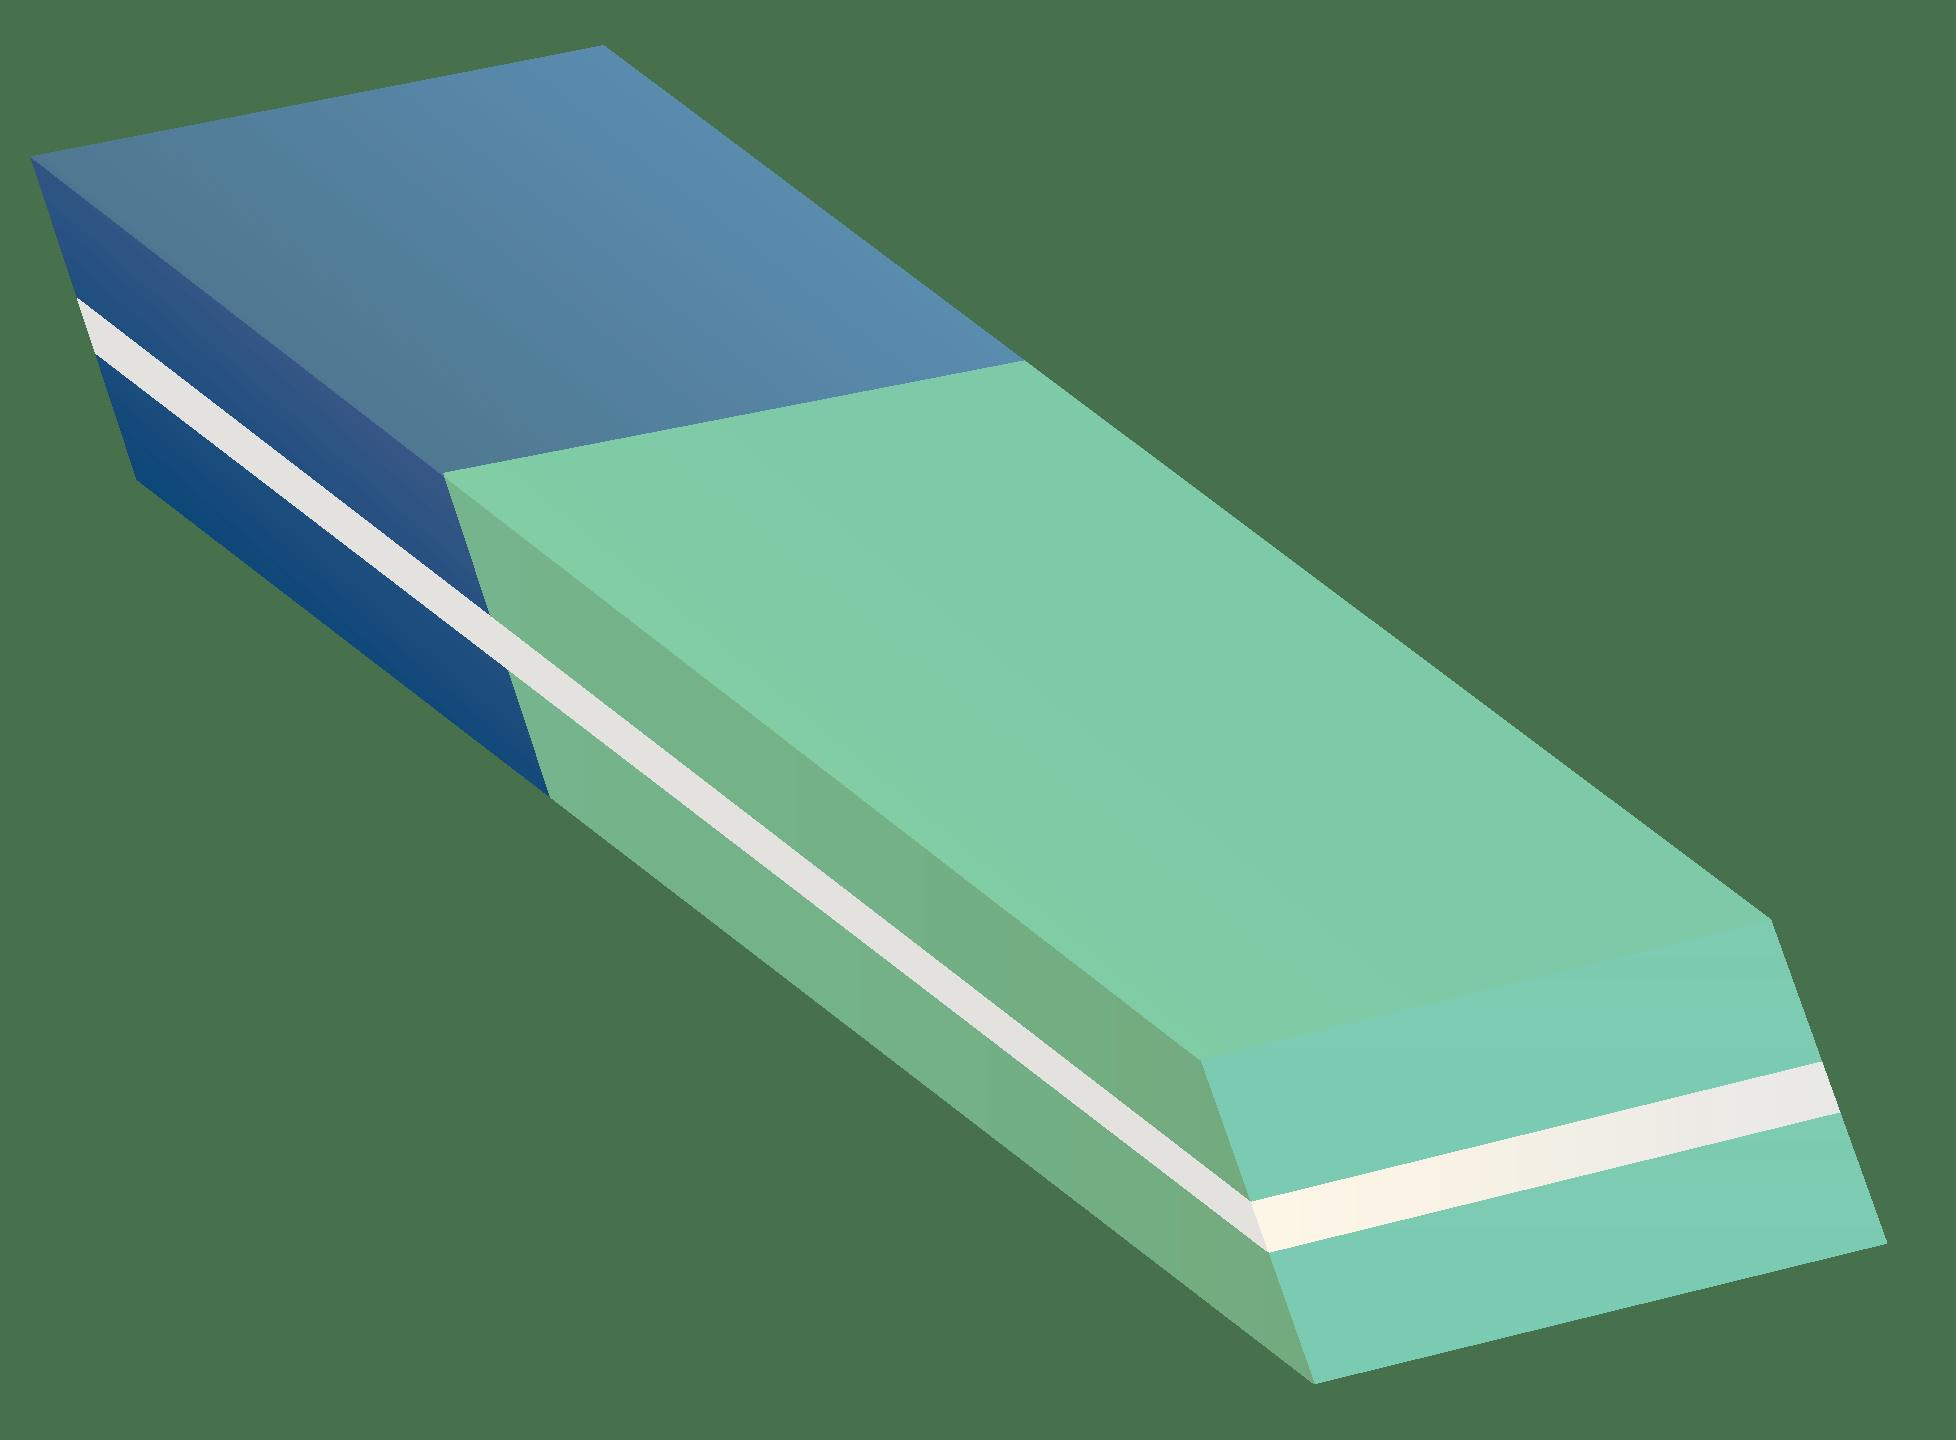 panties latex transparent rubber Adult